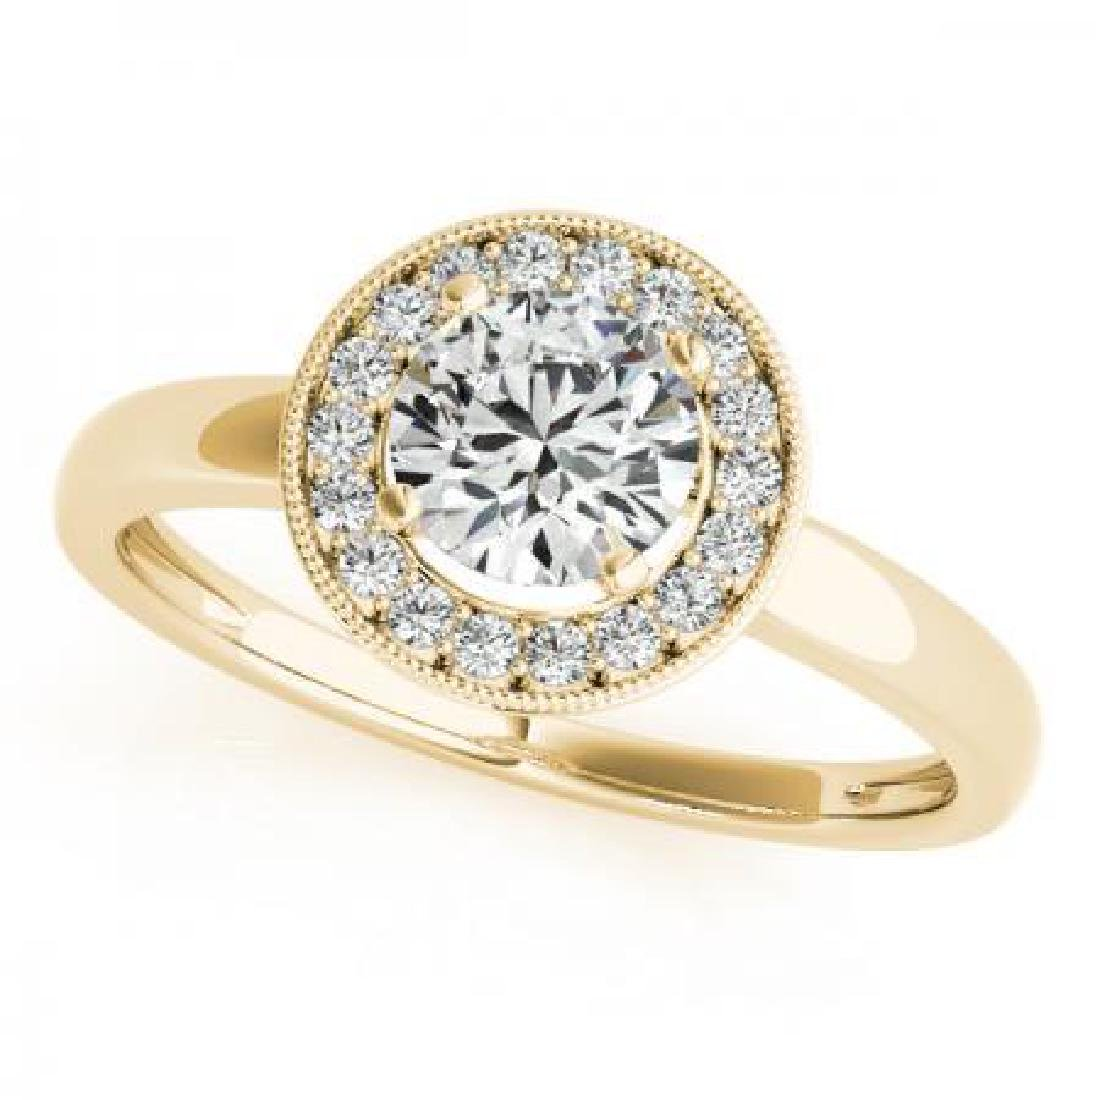 CERTIFIED 18K YELLOW GOLD 1.36 CT G-H/VS-SI1 DIAMOND HA